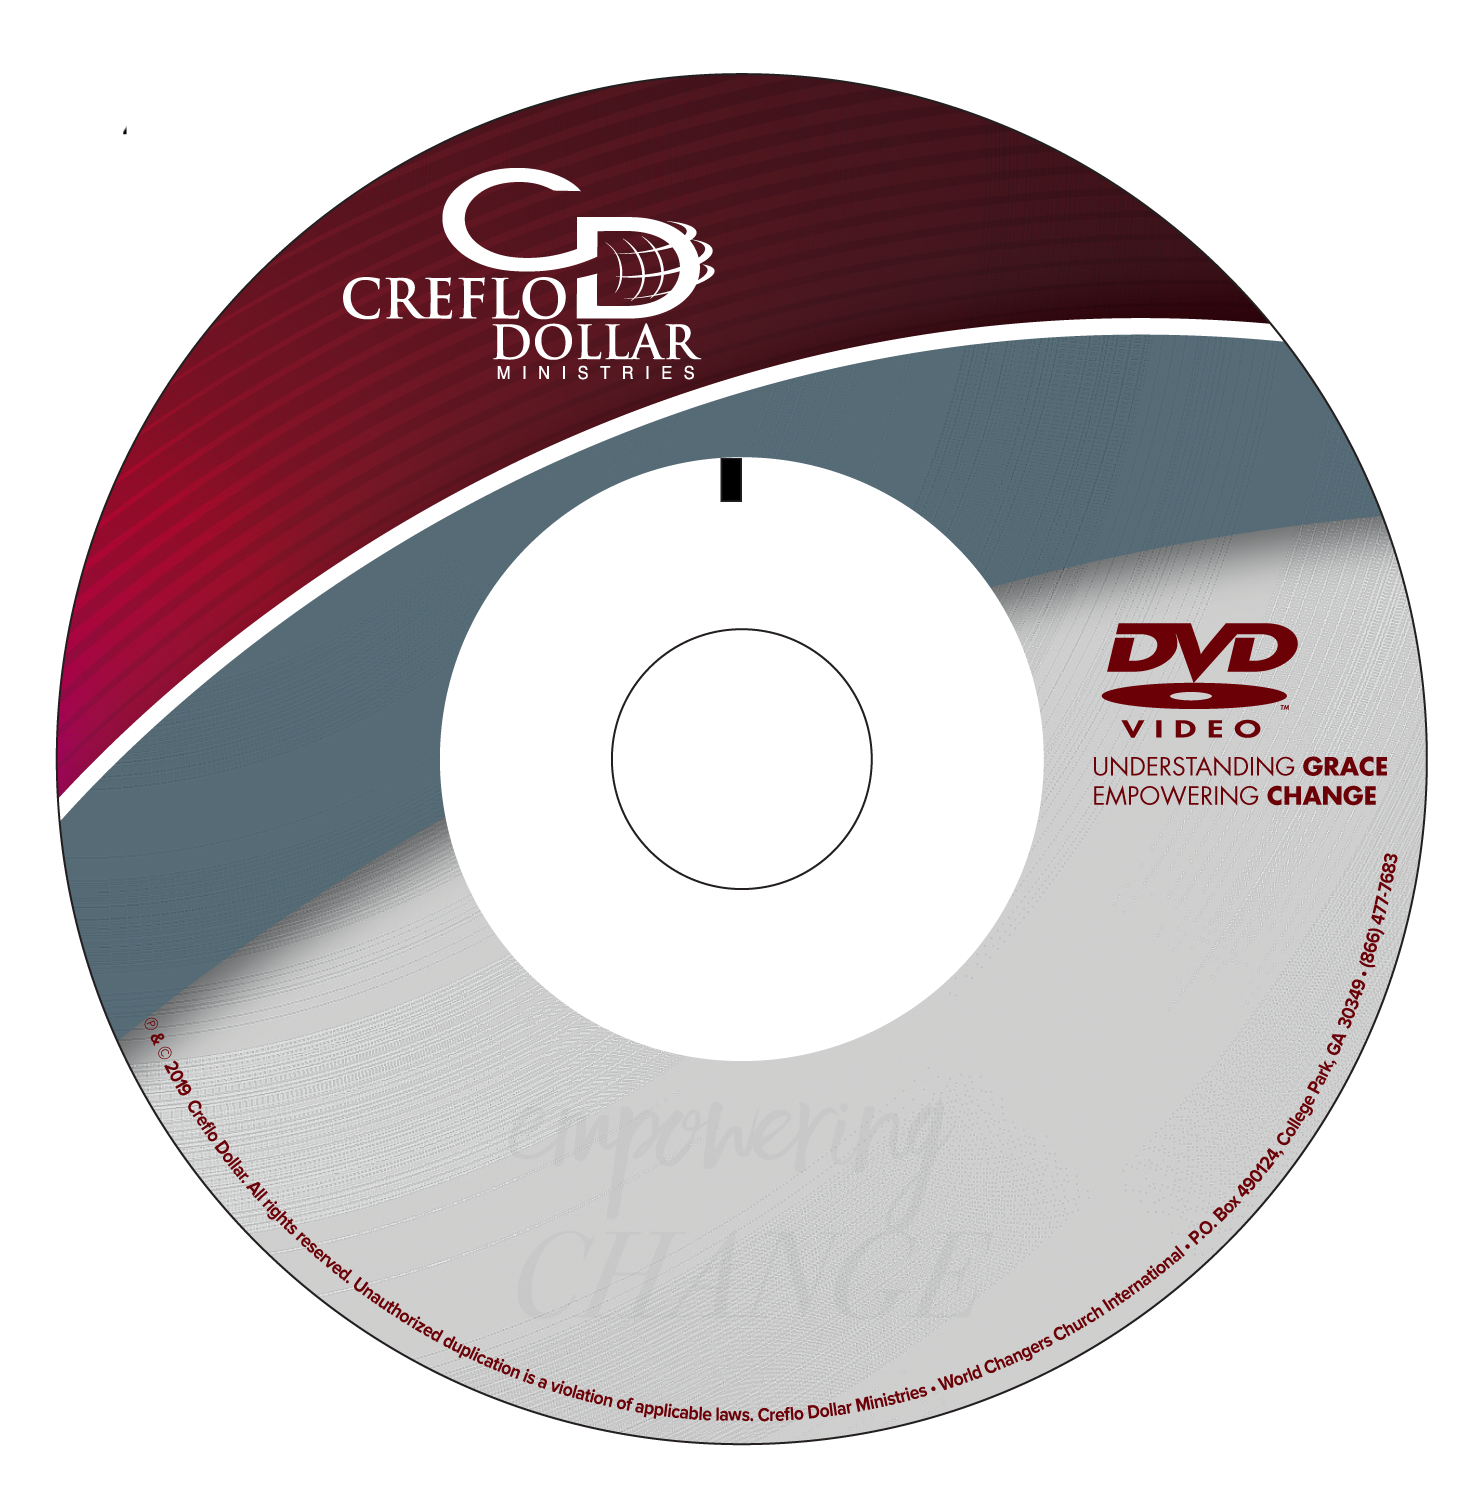 072819 Sunday Service DVD 10am